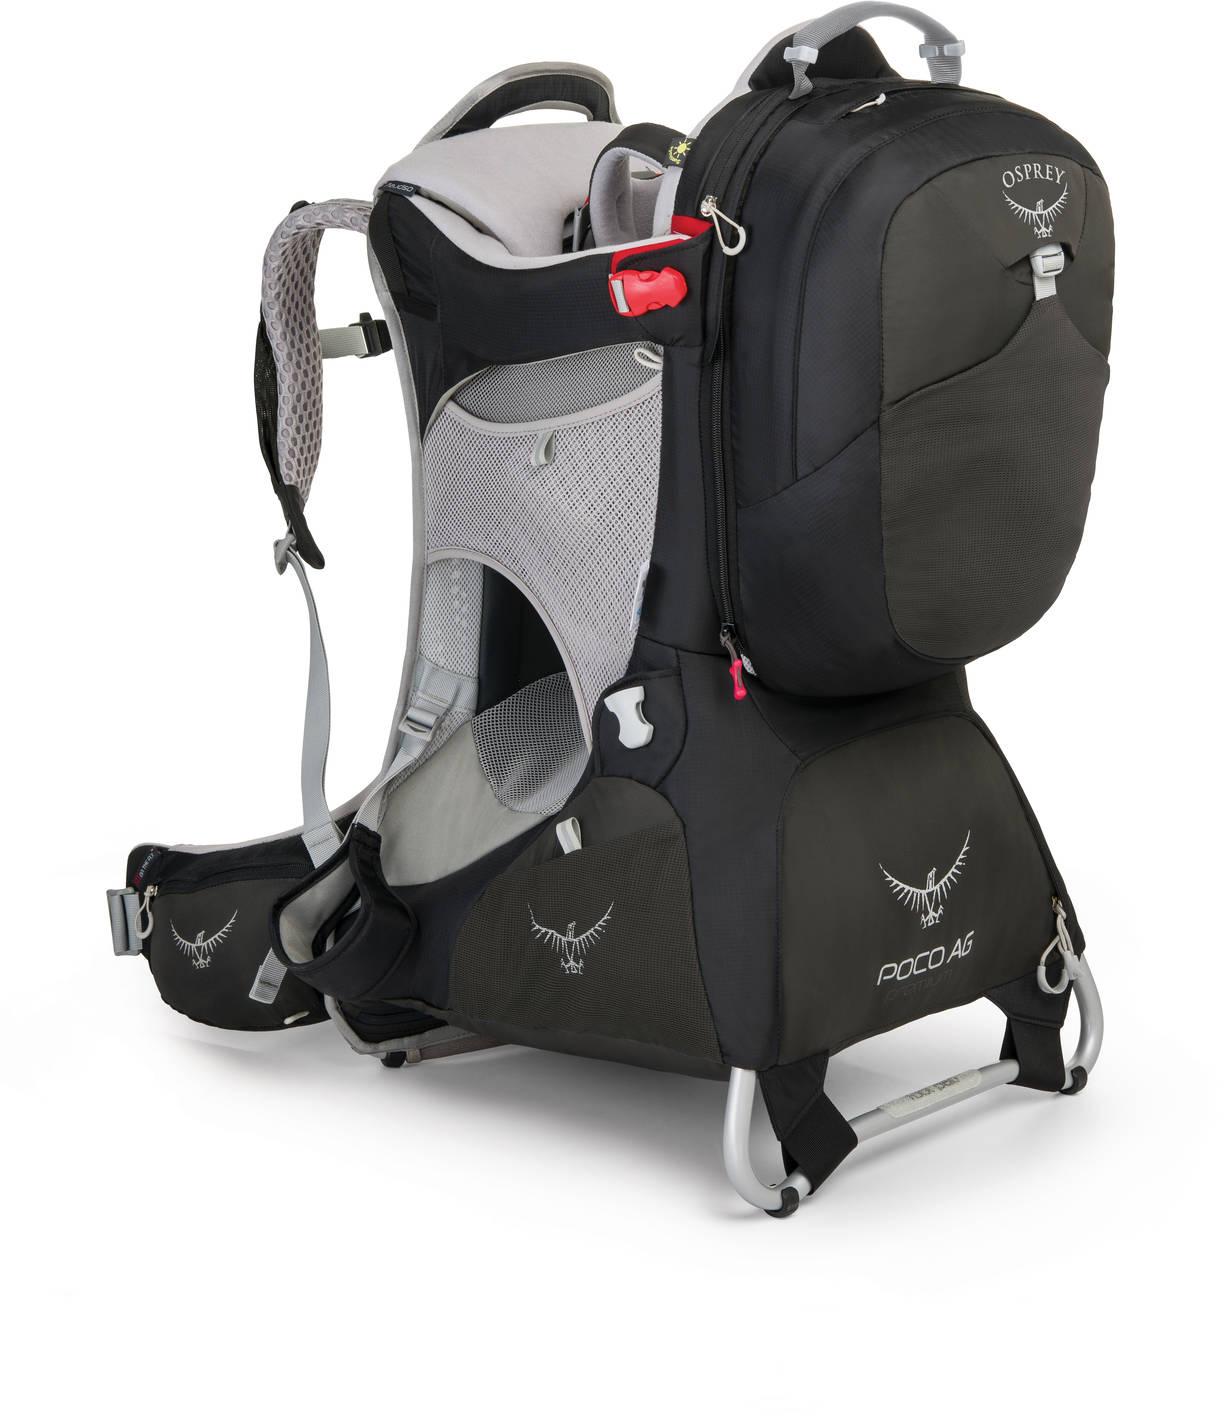 Переноски для детей Переноска для детей туристическая Osprey Poco AG Premium Poco_AG_Premium_Side_Black_web.jpg